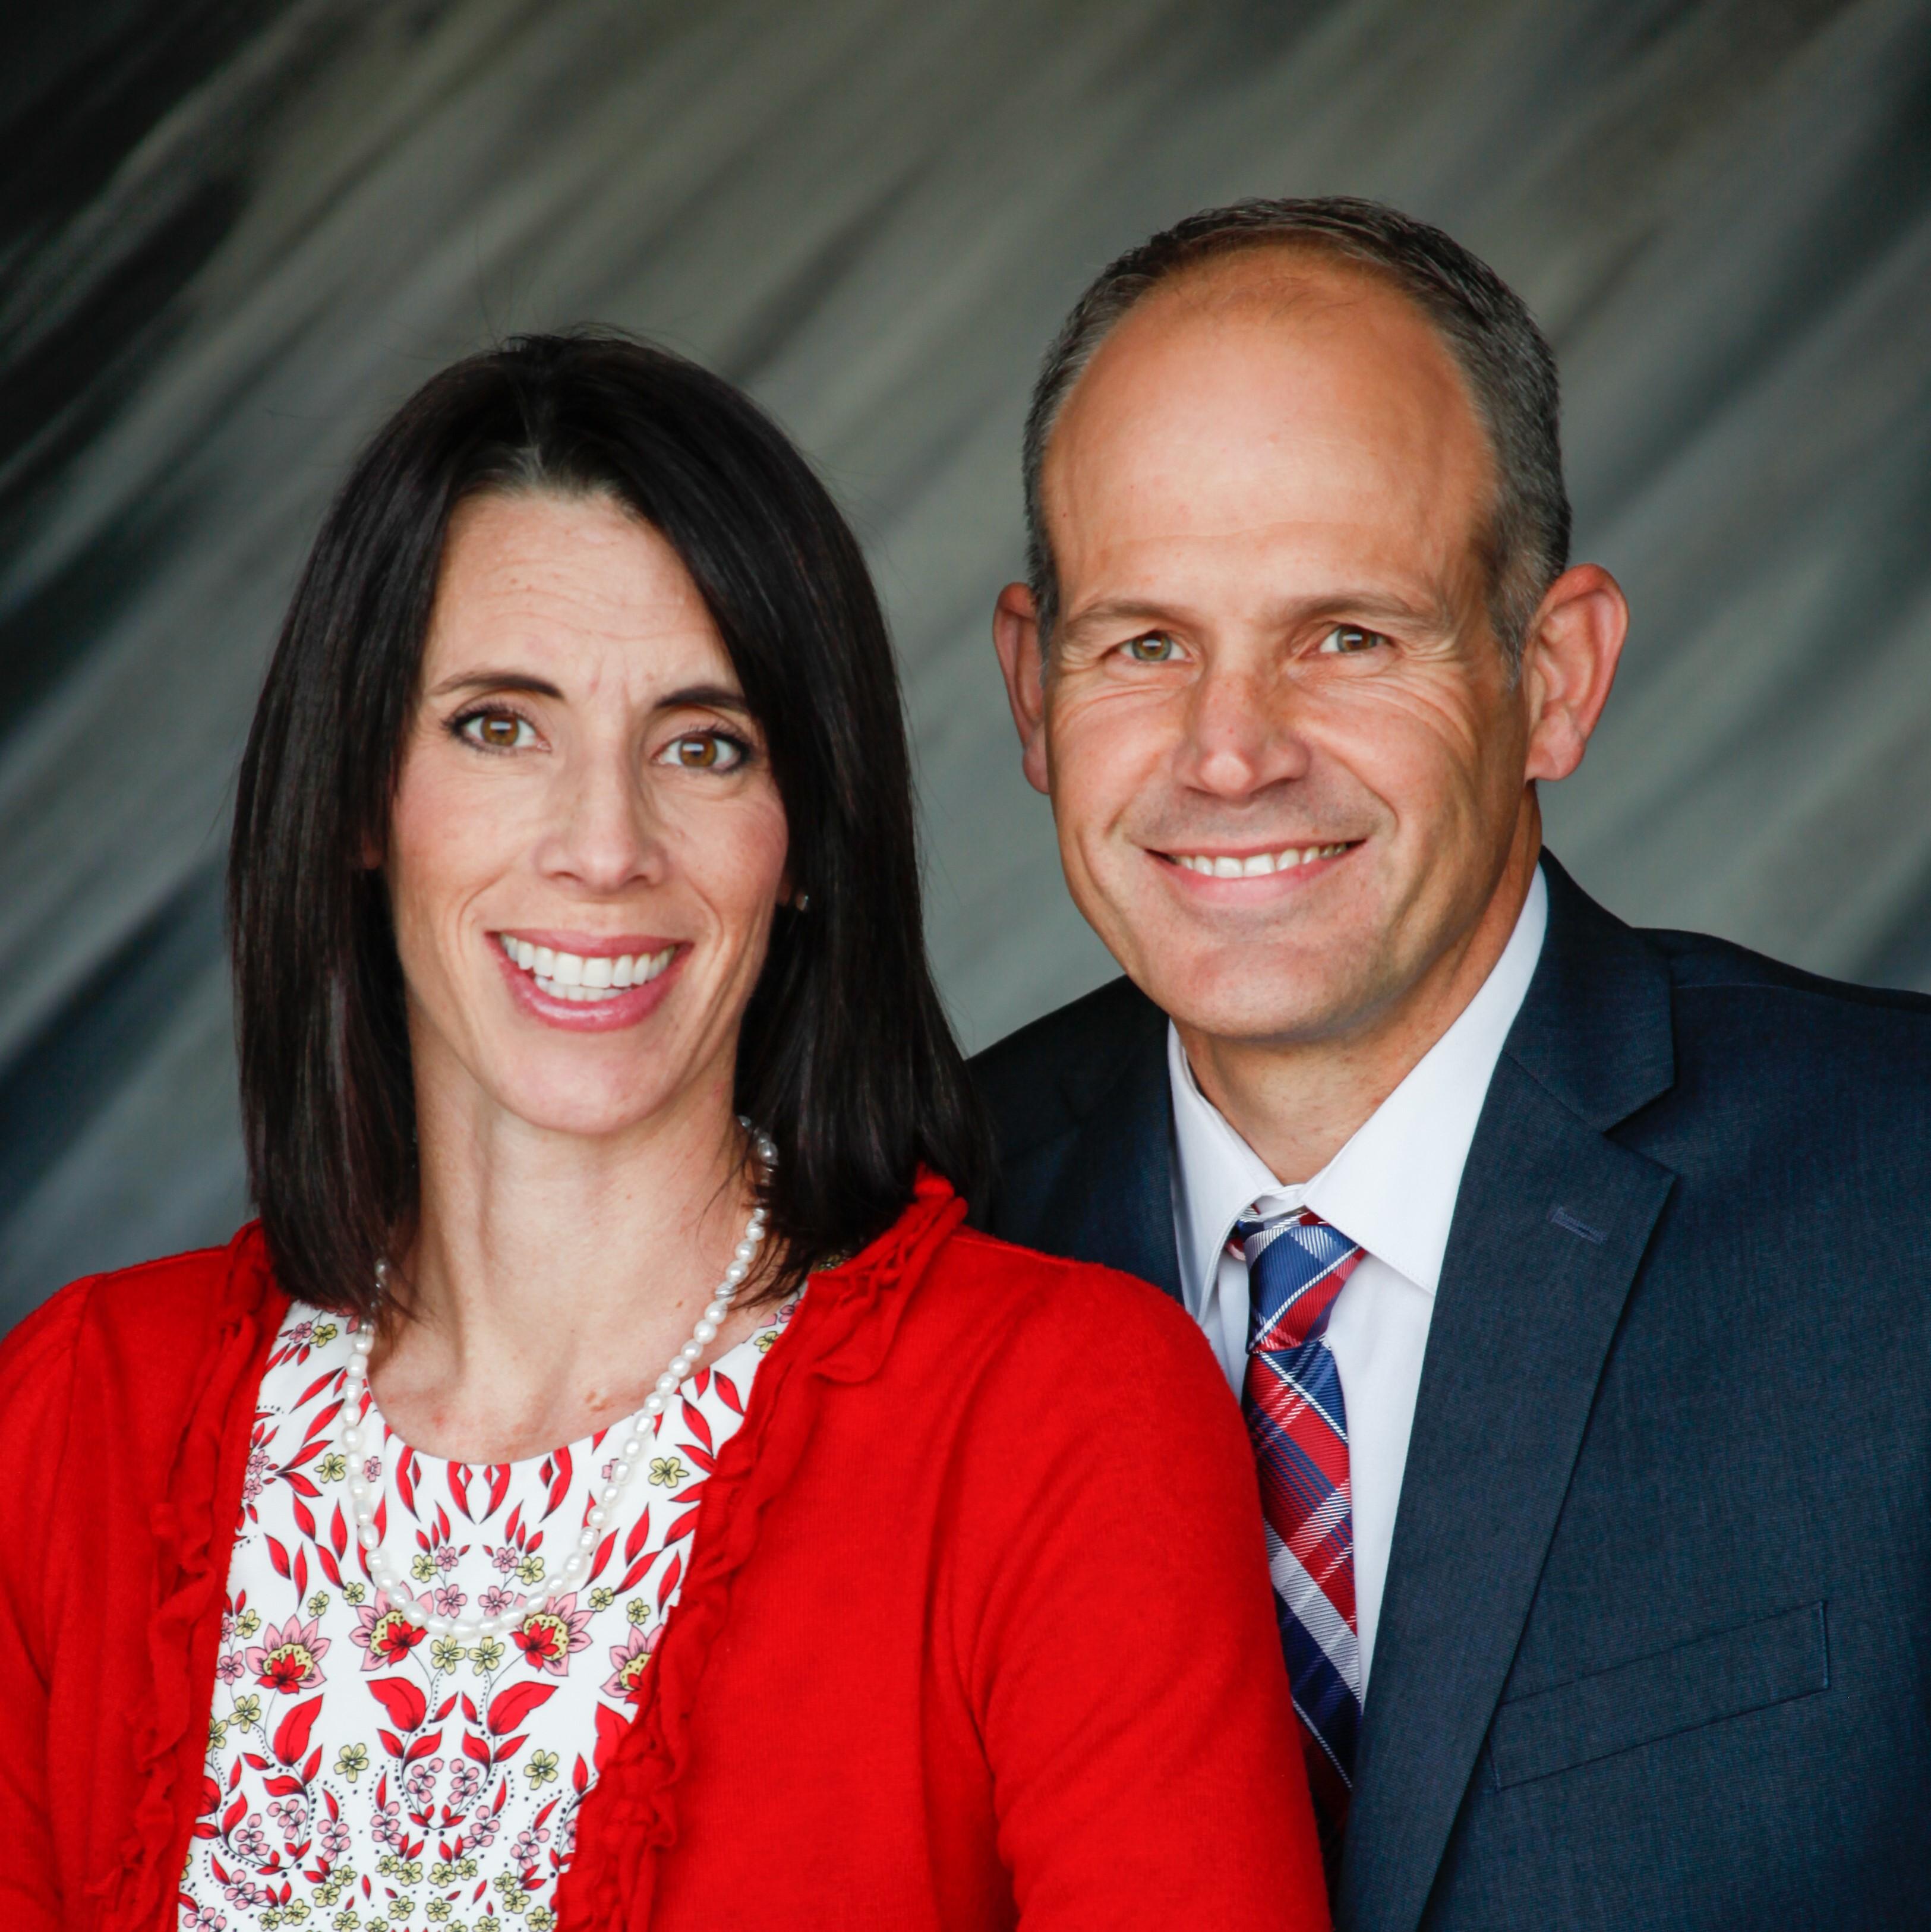 Stephanie L. and Jason J. Tveten